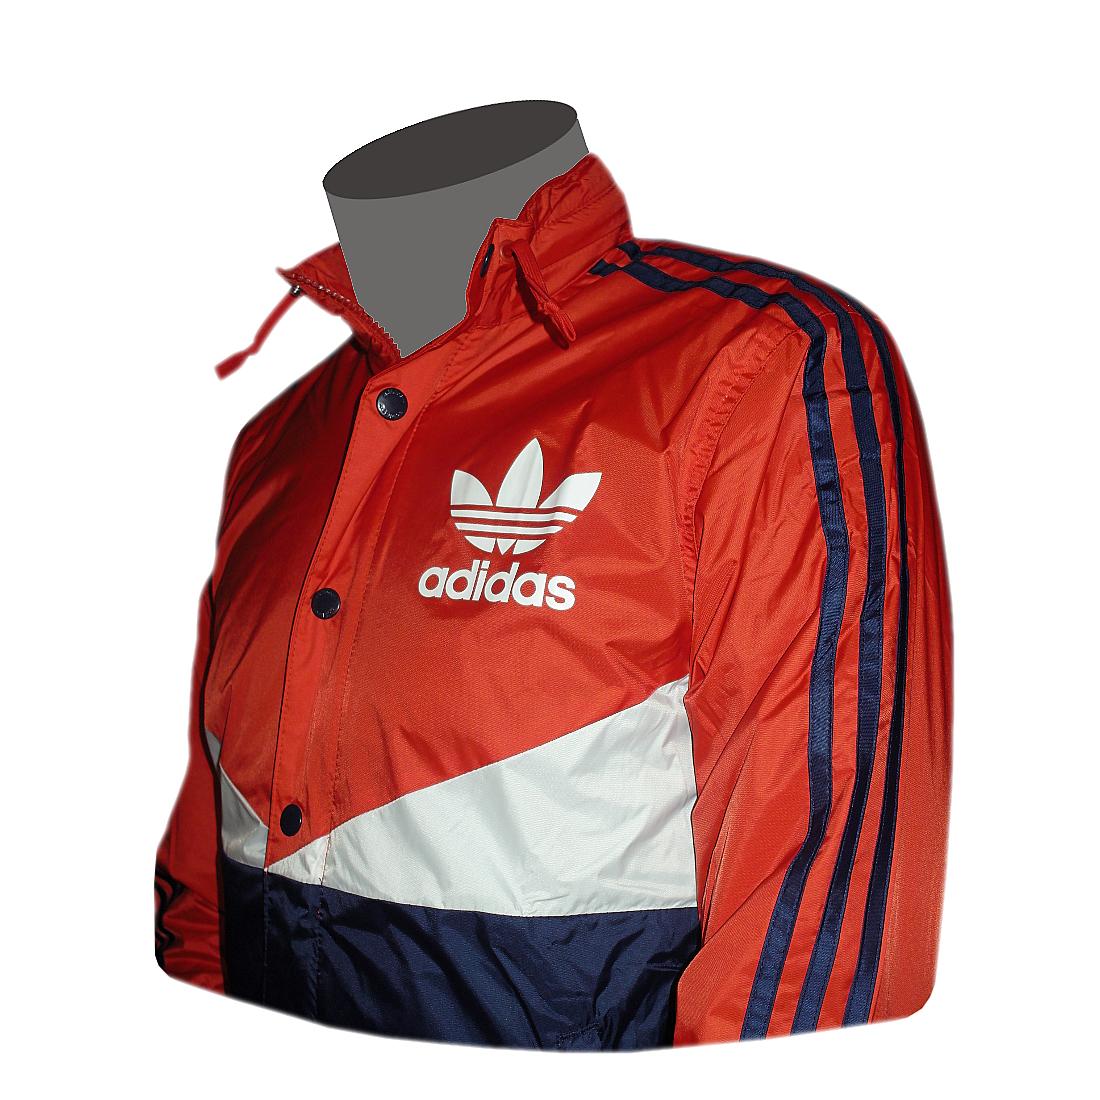 Adidas Originals AC Windbreaker Rot/weiß/blau Windjacke